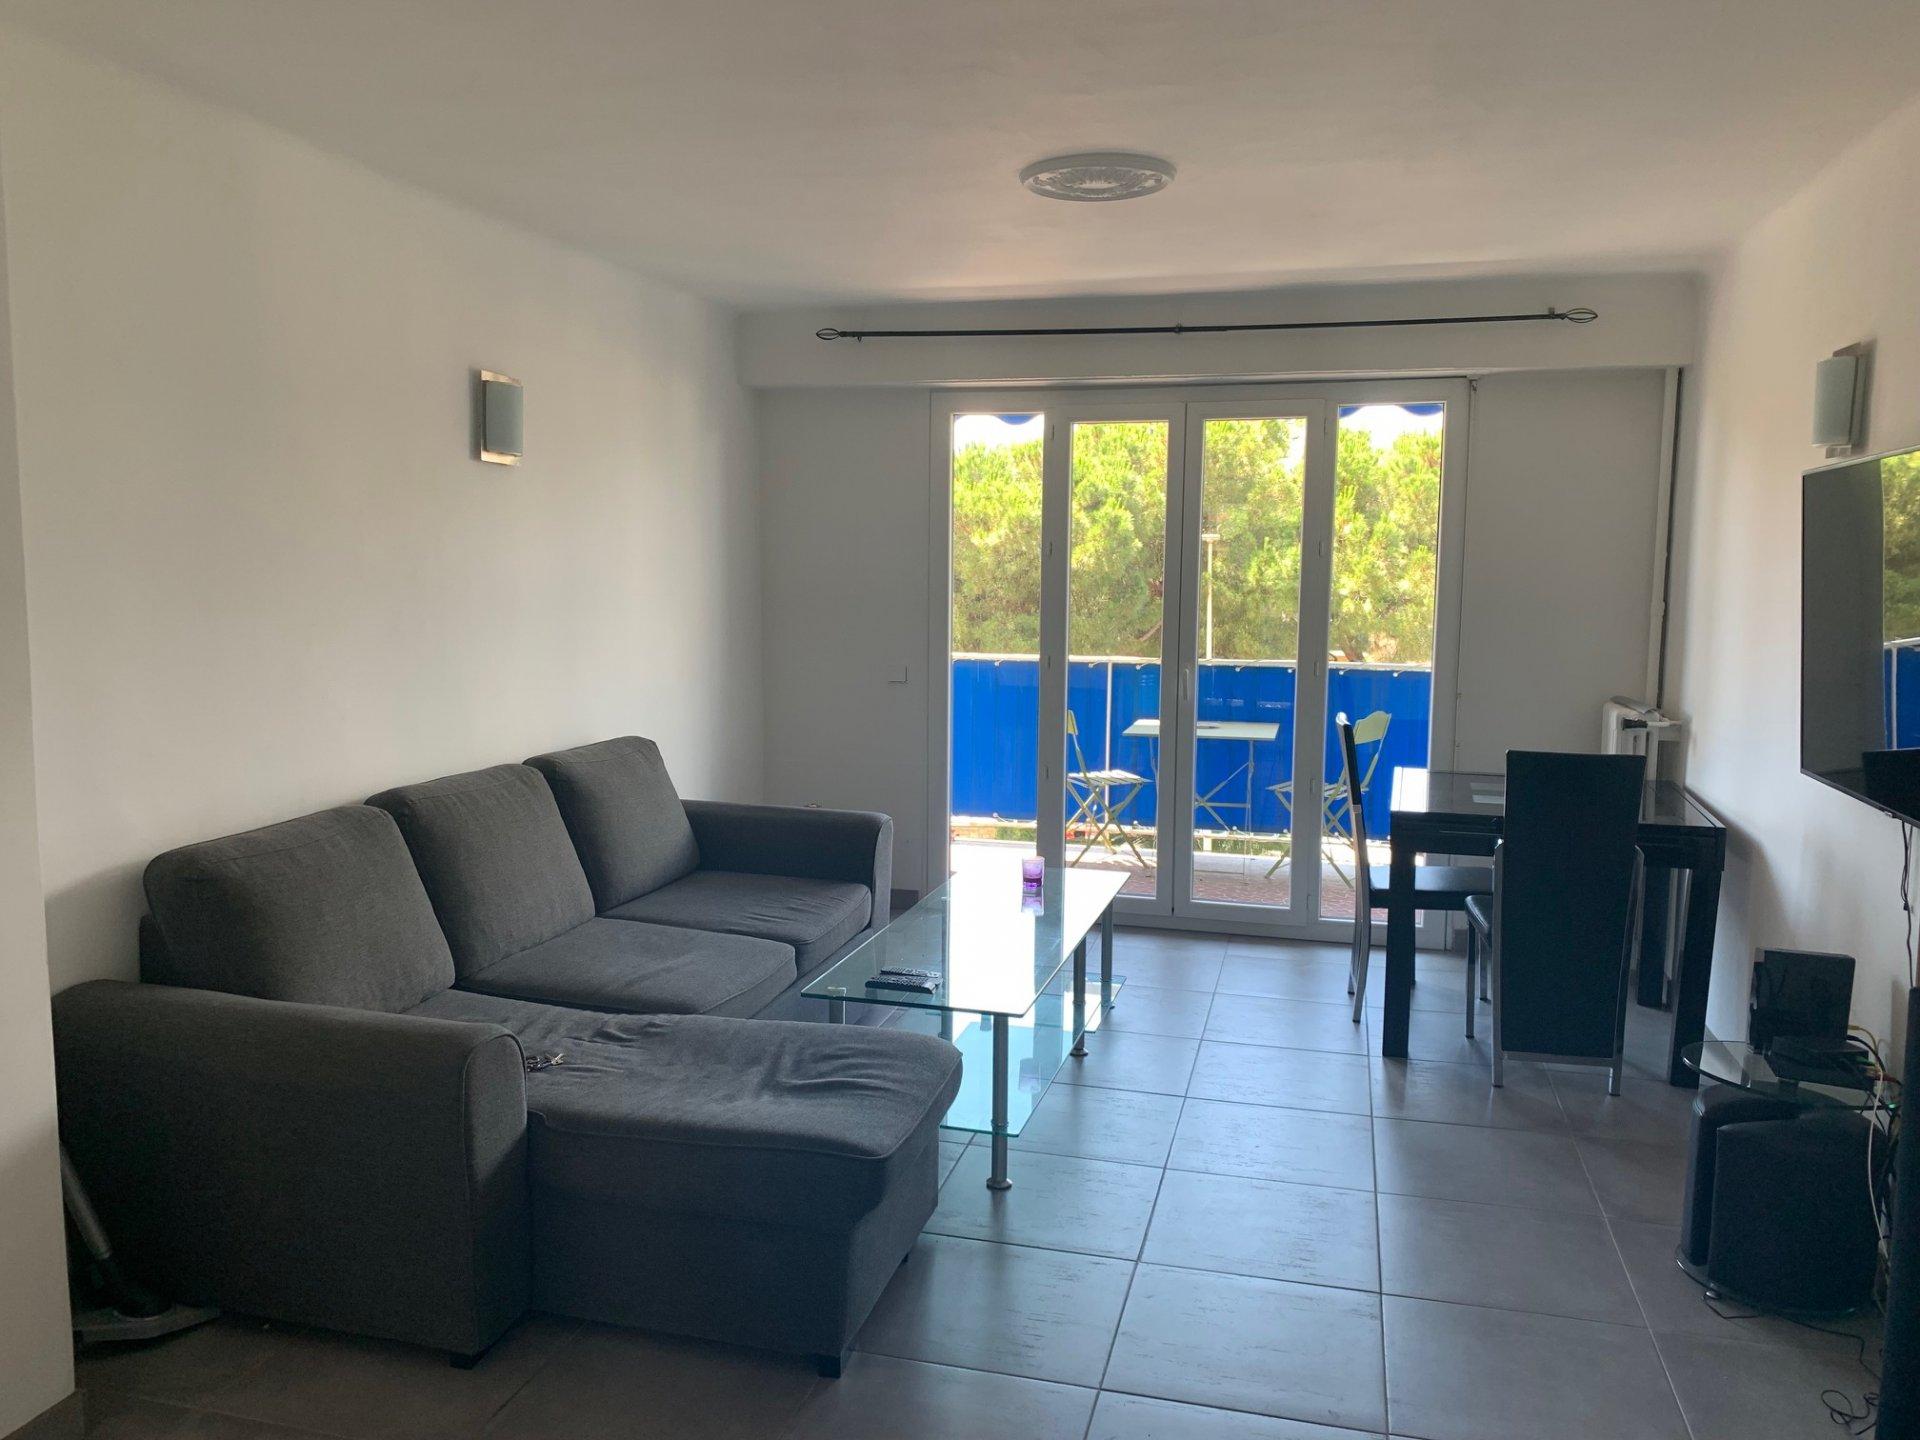 Affitto Appartamento - Nizza (Nice) Mont Boron